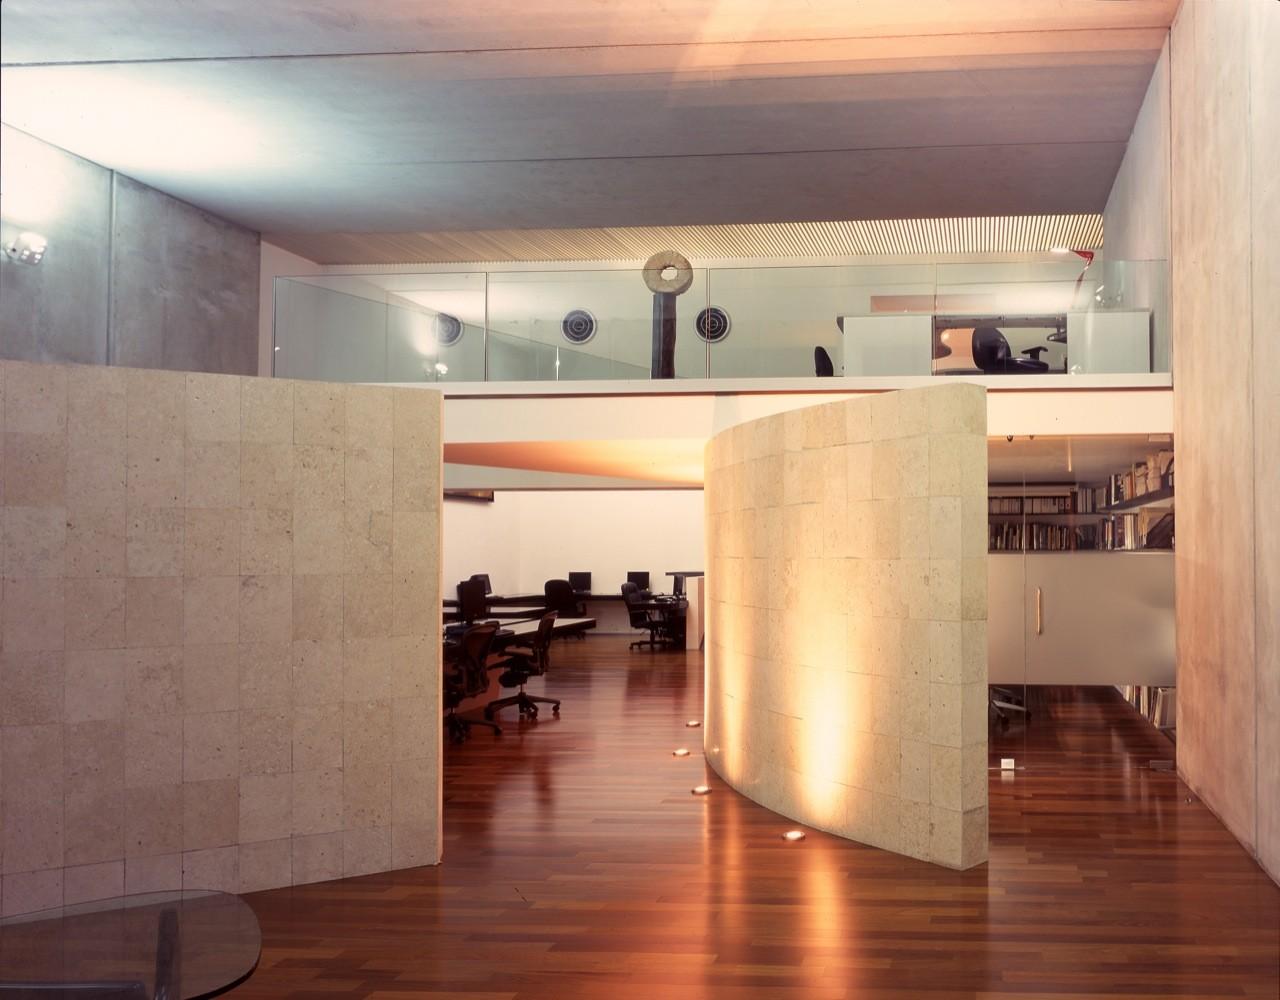 Galer a de estudio de arquitectos mu oz arquitectos 4 - Estudio de arquitectos ...